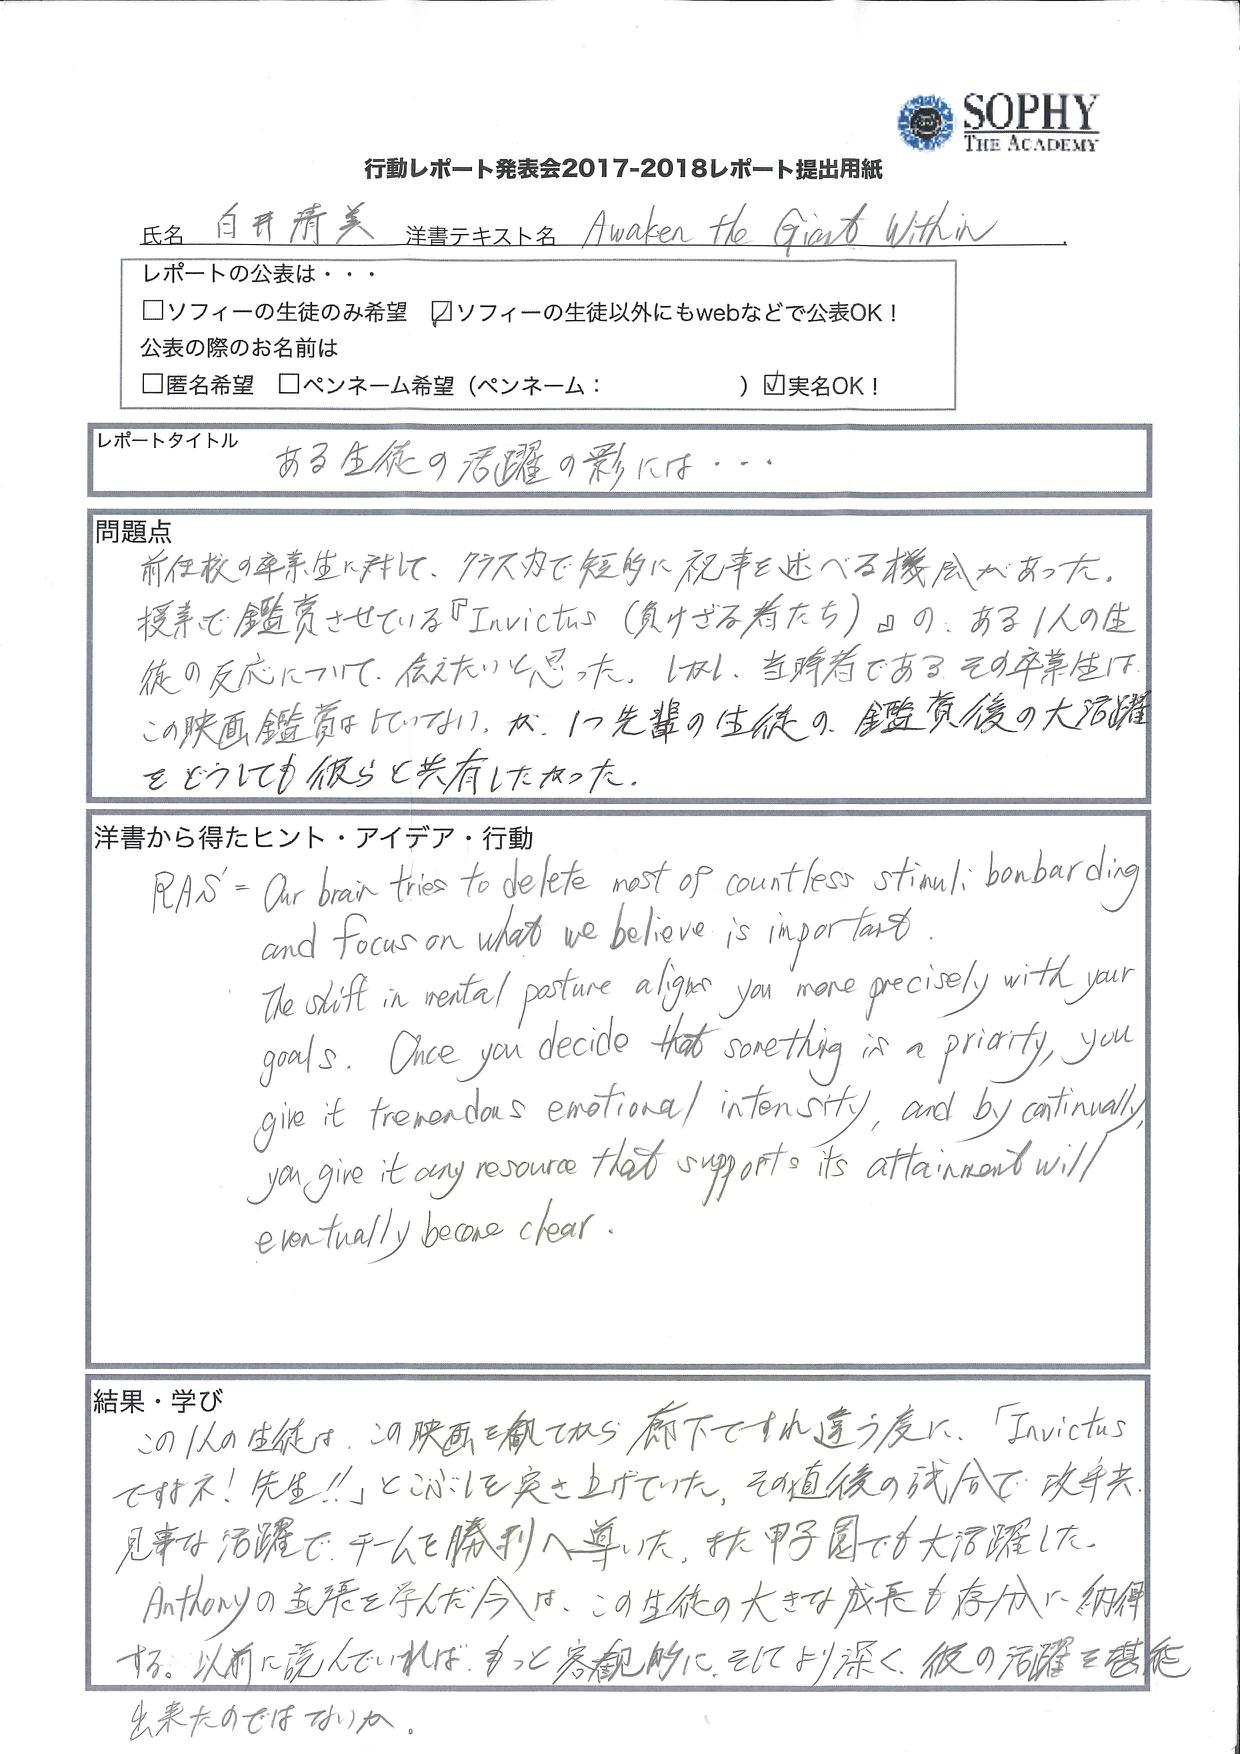 Shirai_Kiyomi_1802